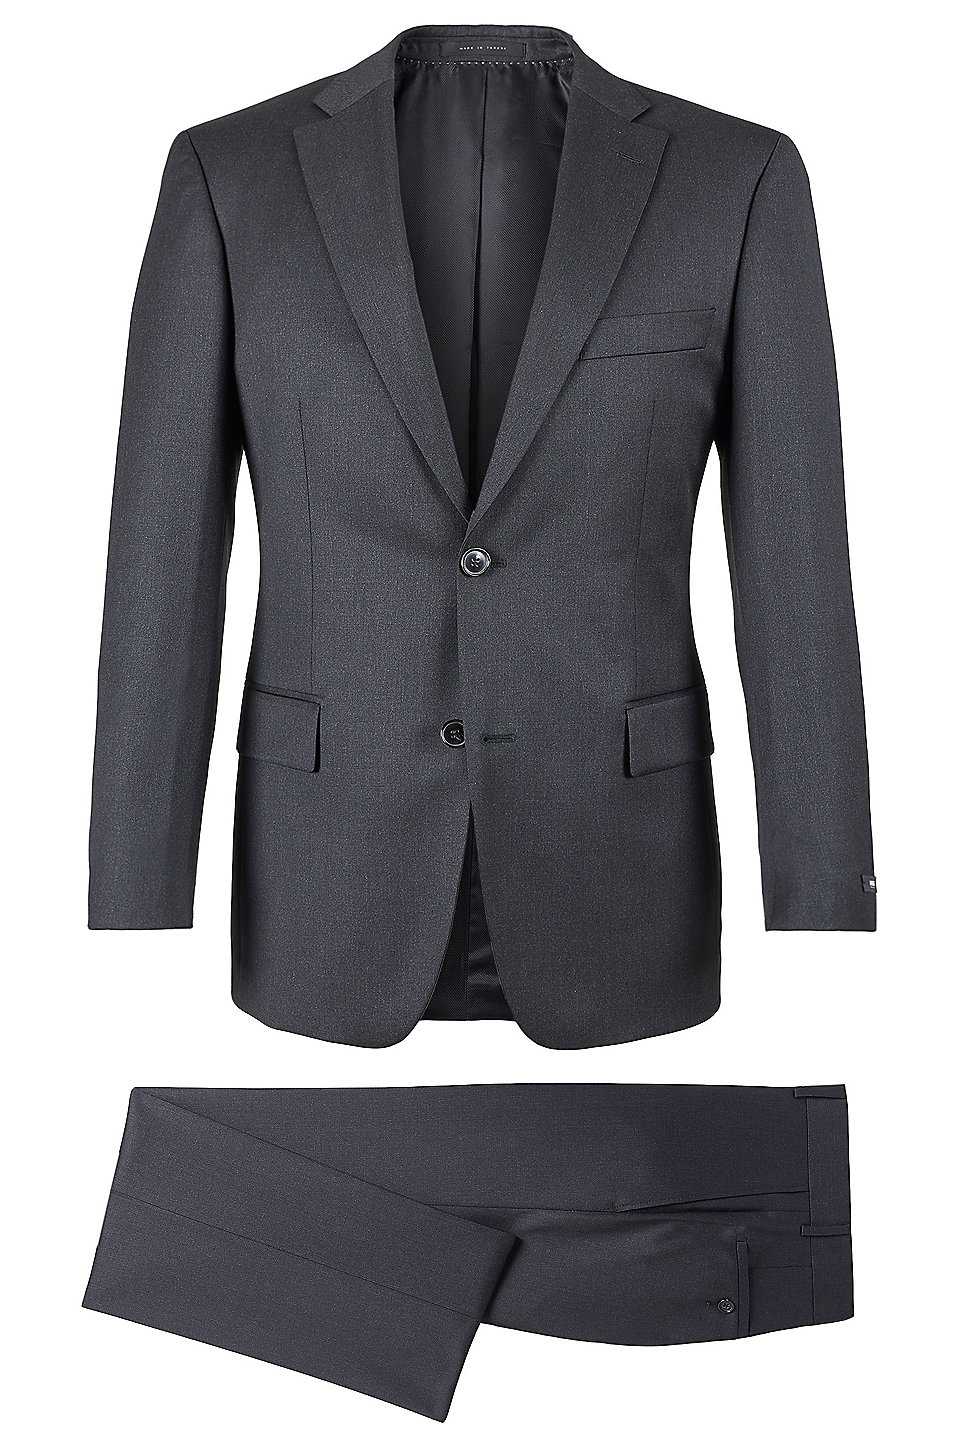 Boss Super 110 Virgin Wool Suit Comfort Fit Pasolini